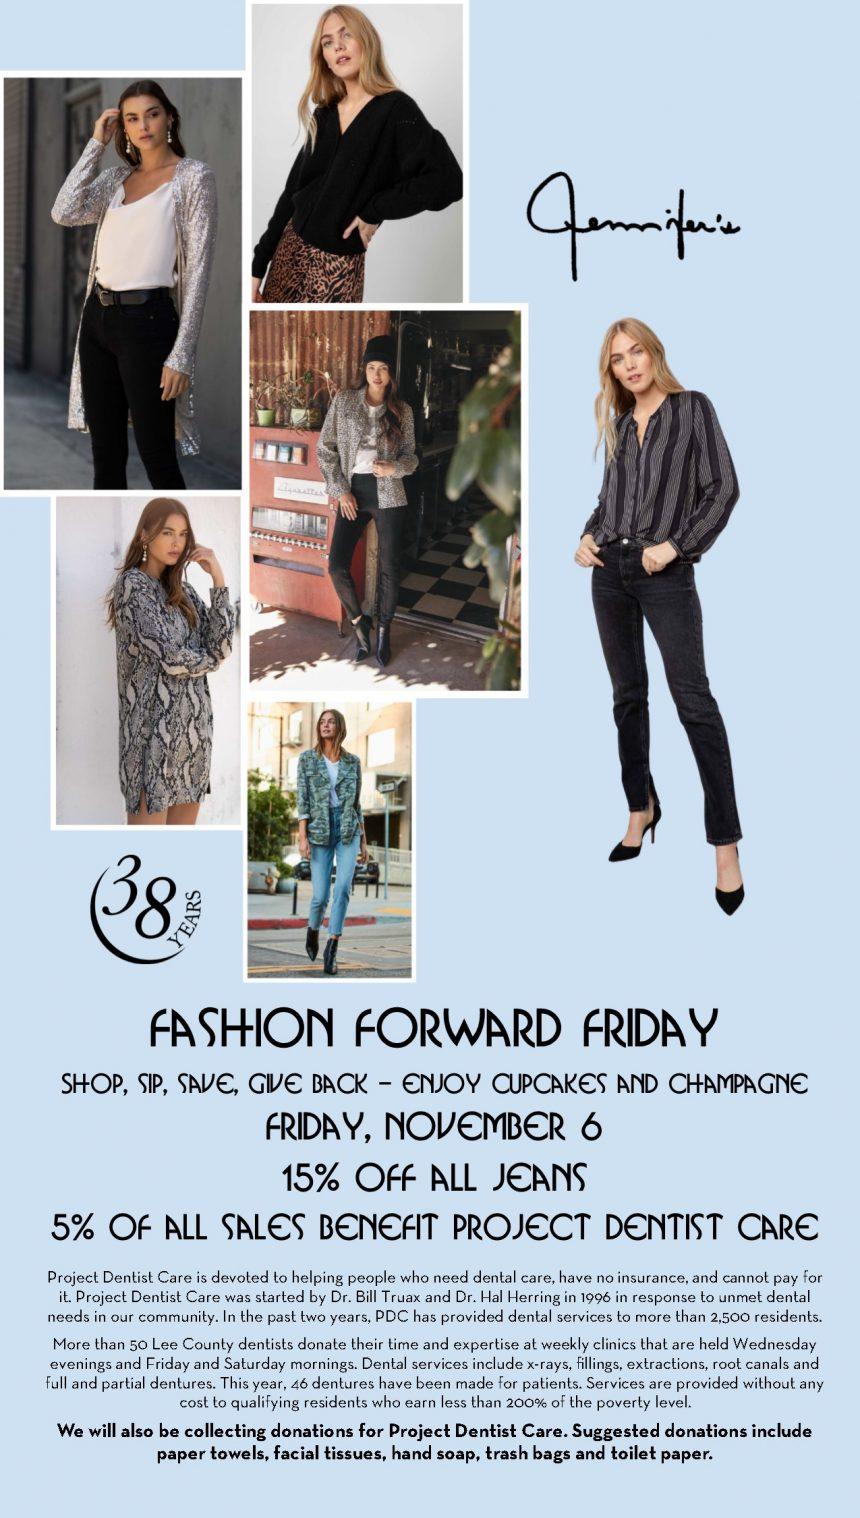 Jennifer's Fashion Forward Friday Benefits Project Dentist Care